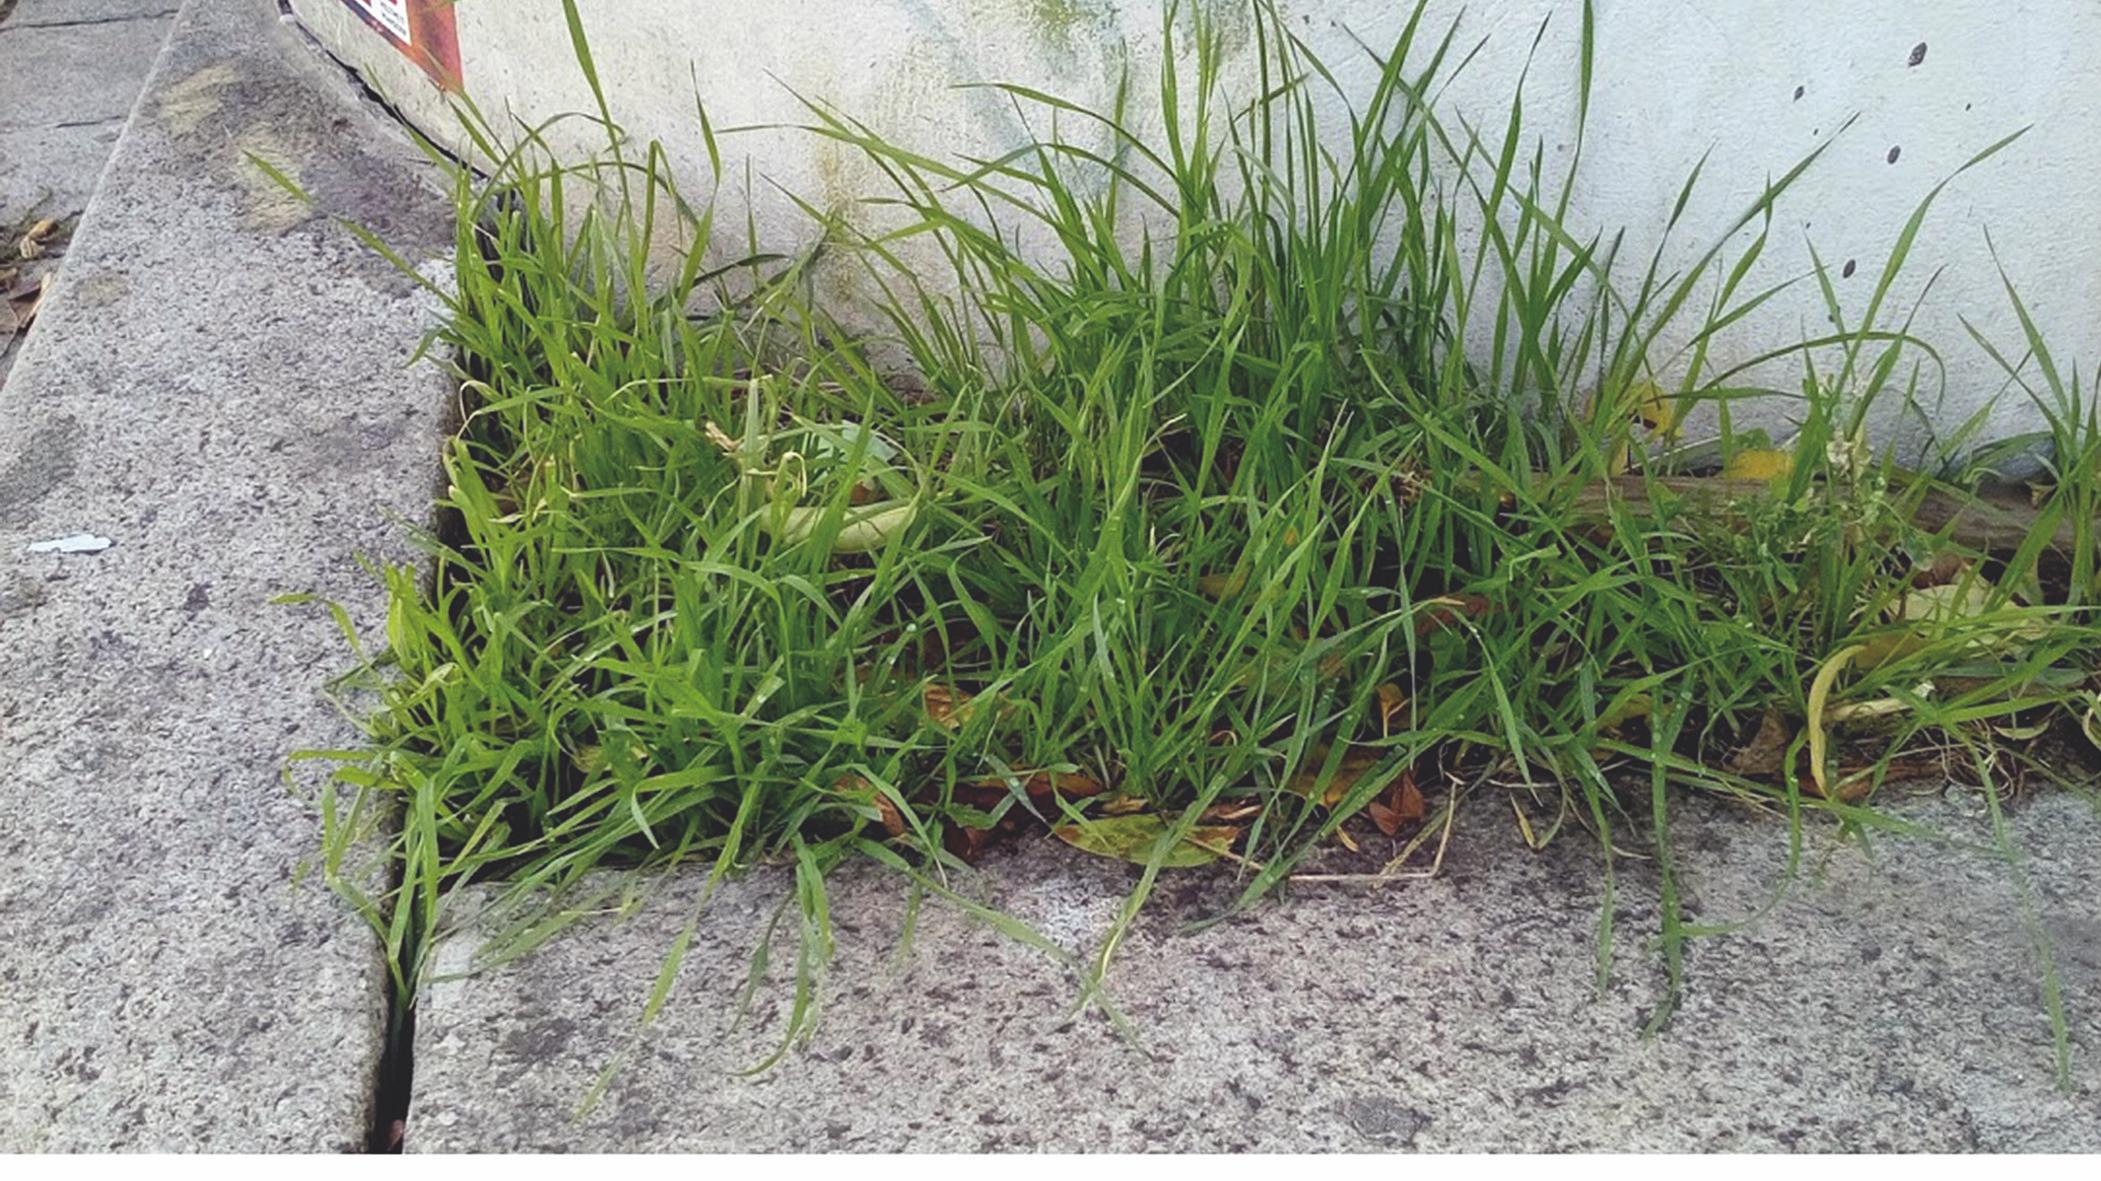 wild grass on concrete